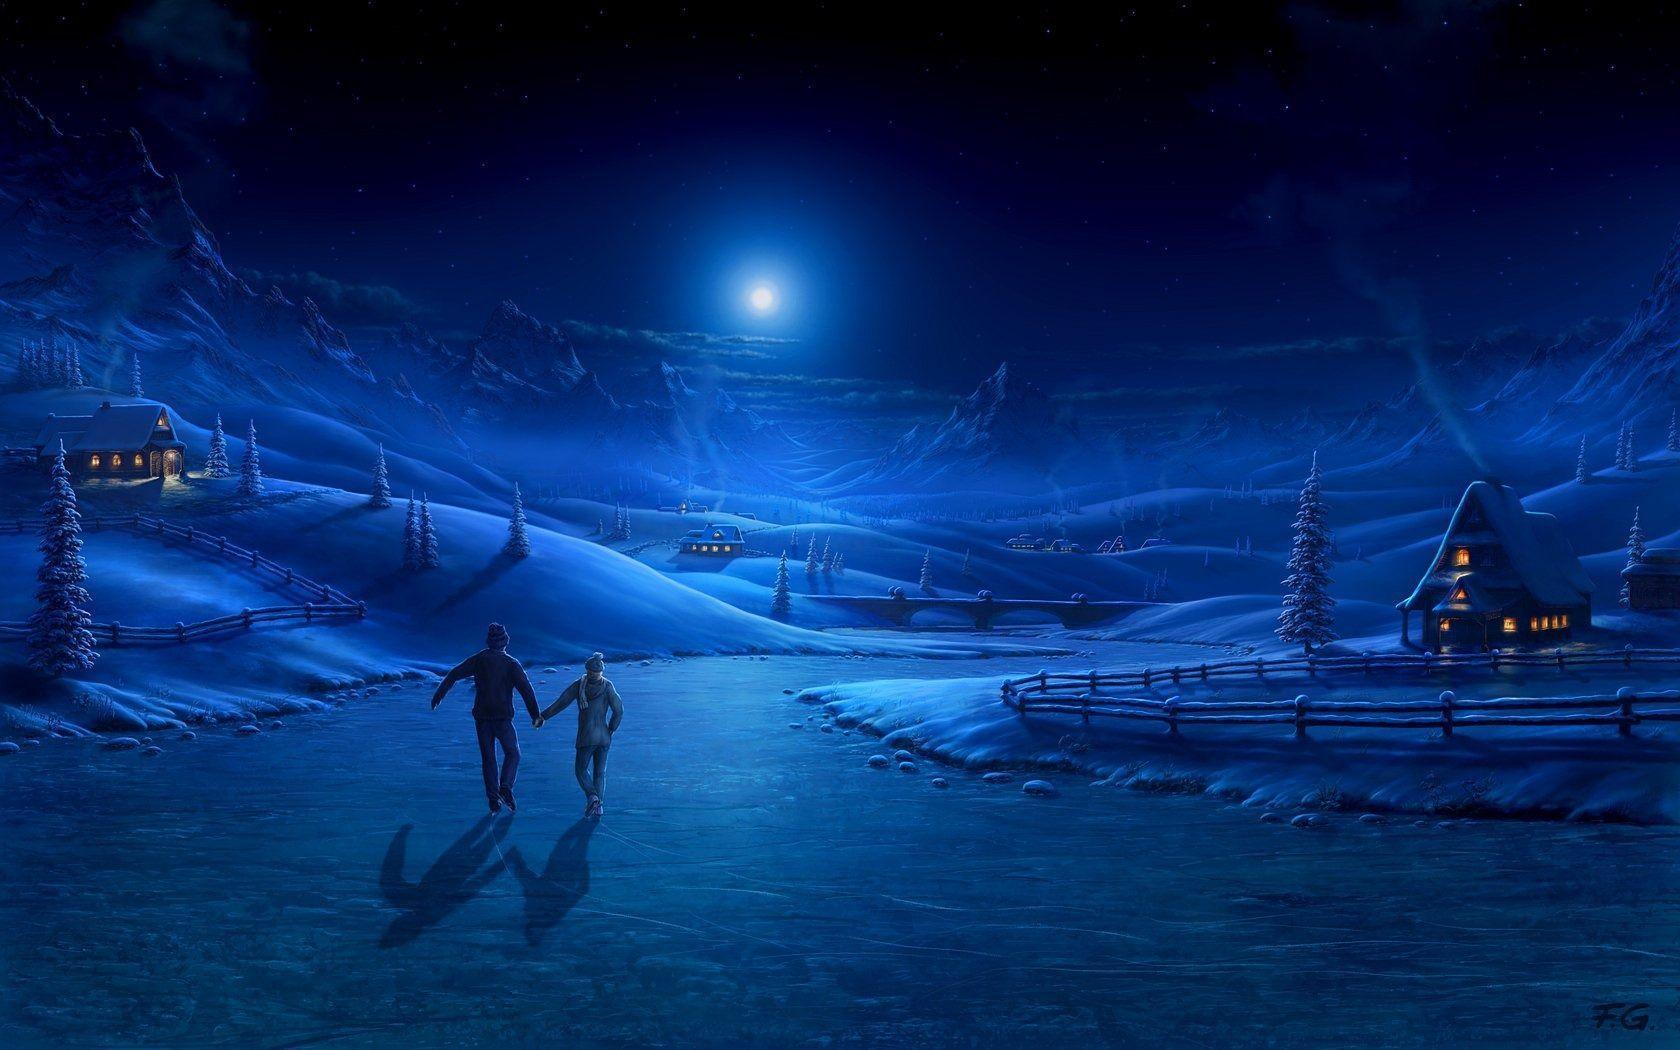 Wallpaper download night - Winter Night Wallpaper 1680x1050 Wallpaper Download